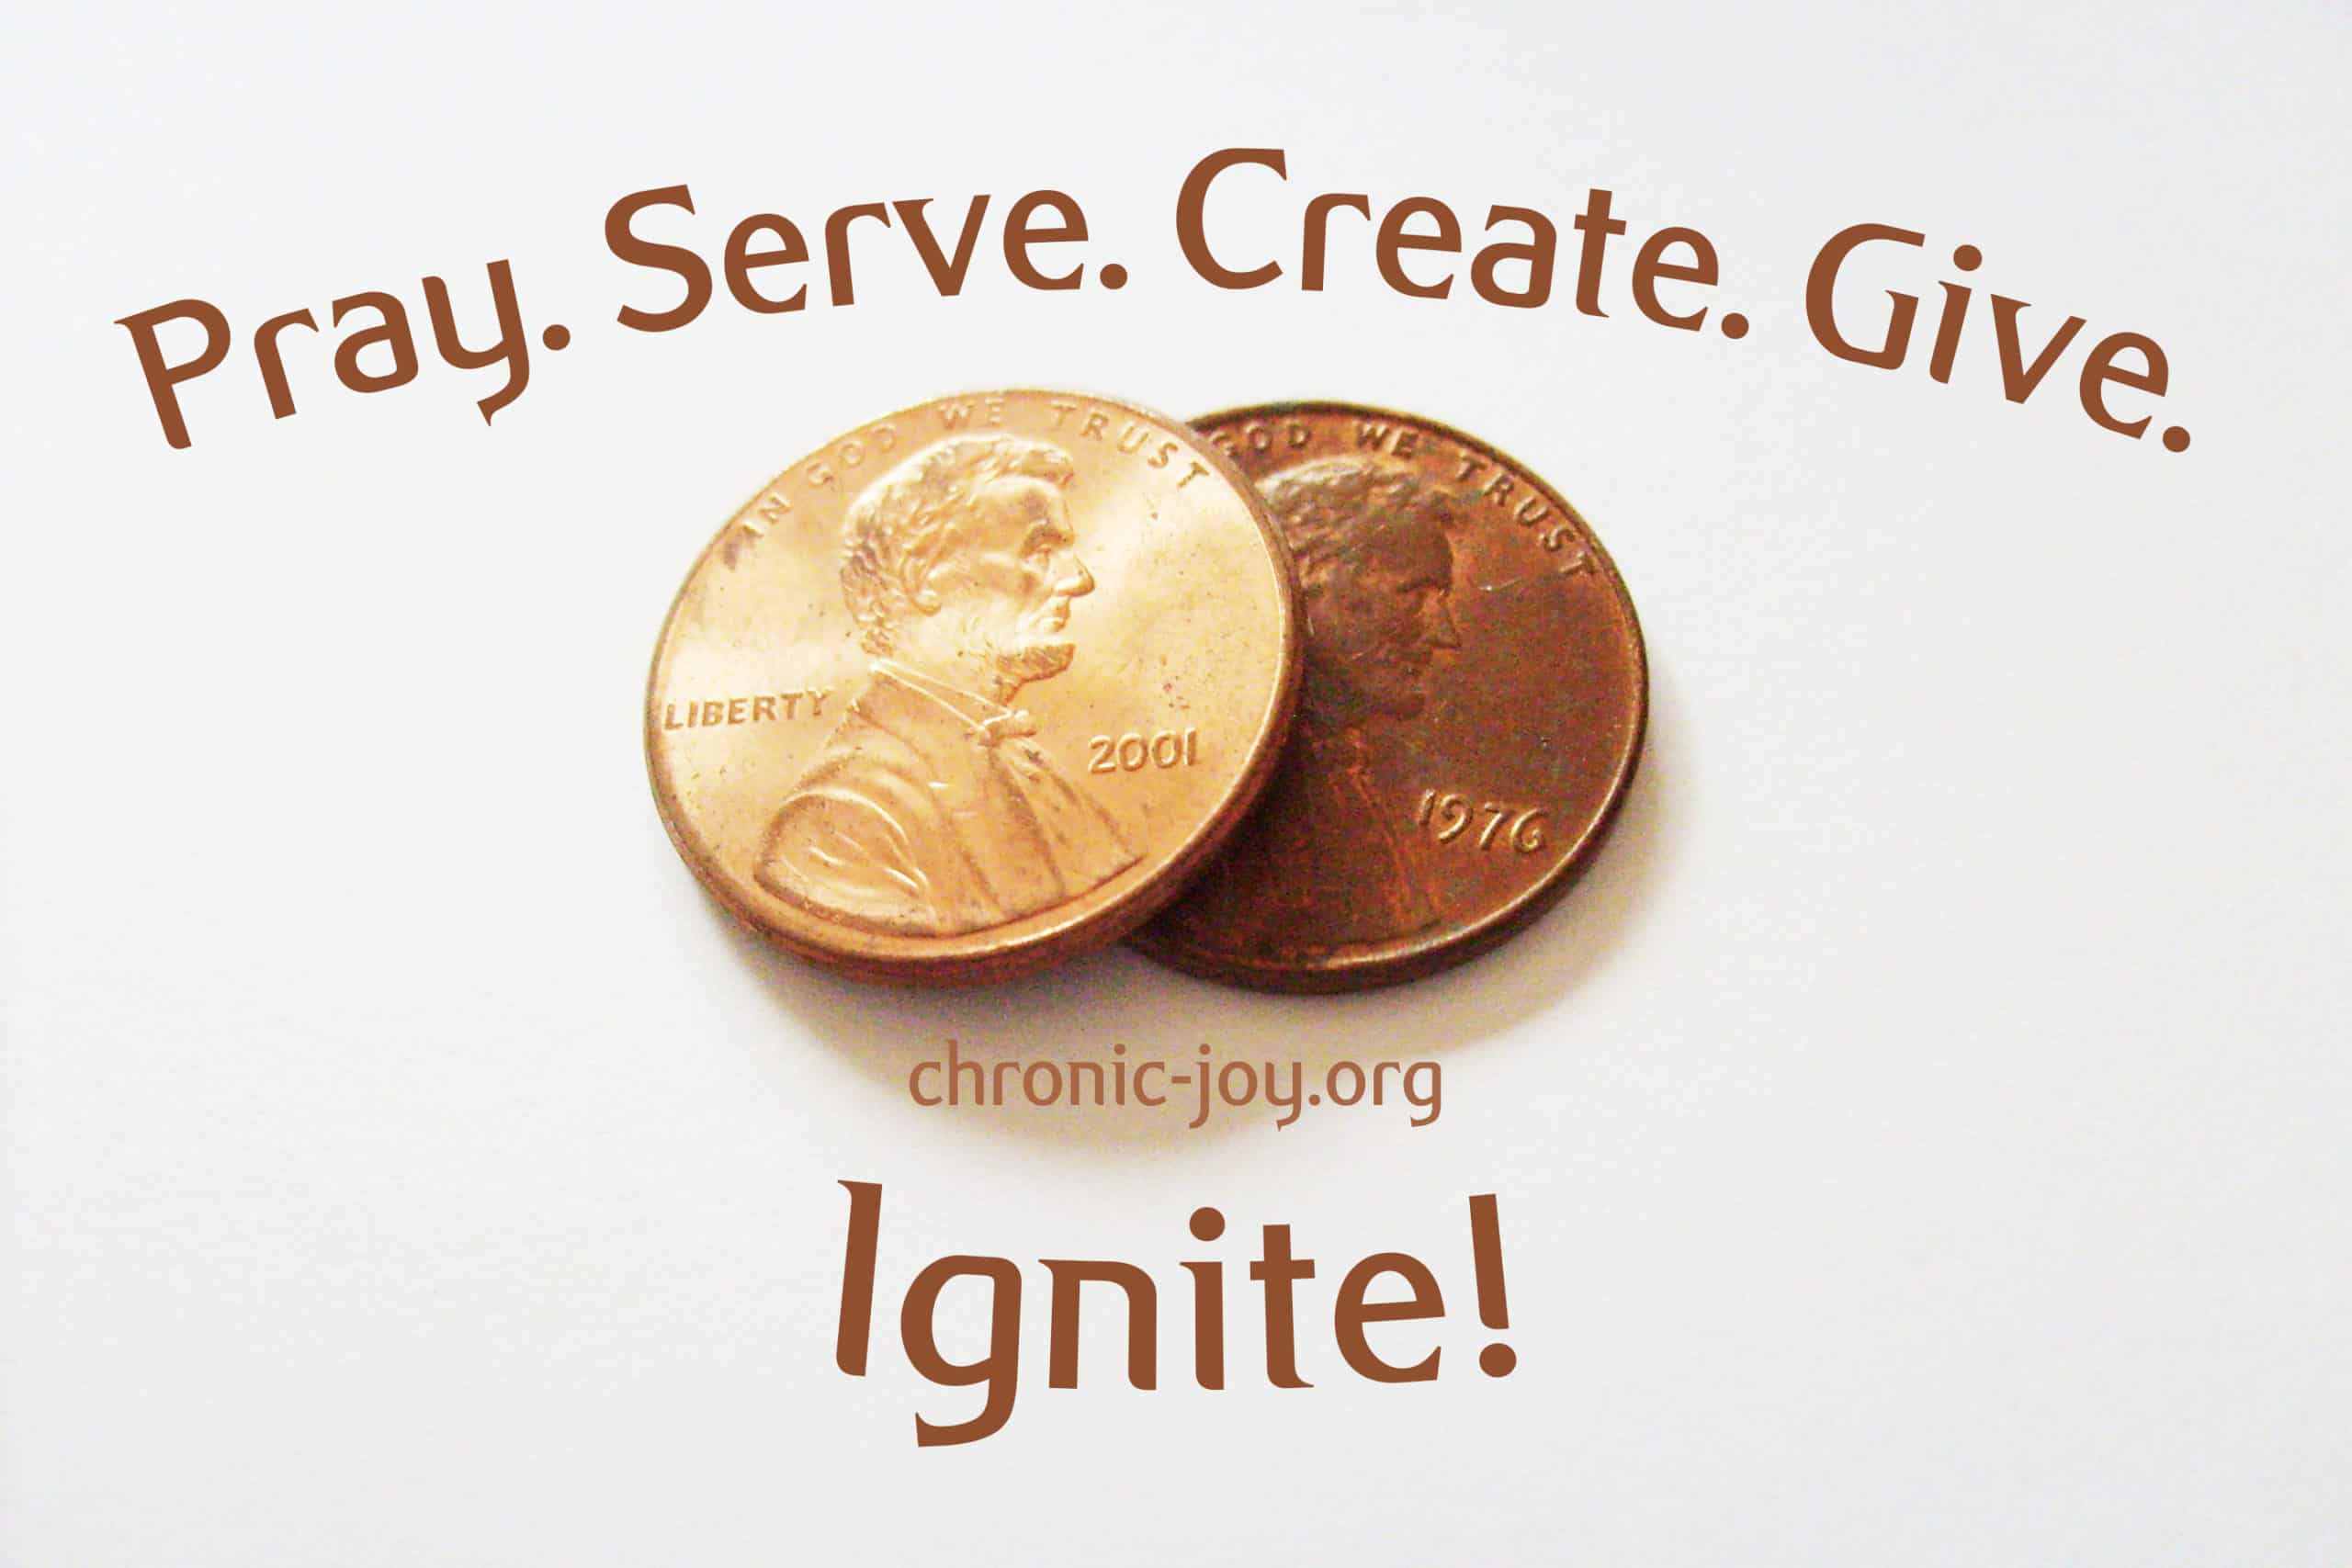 Chronic Joy® • Pray. Serve. Give. Create. Ignite.